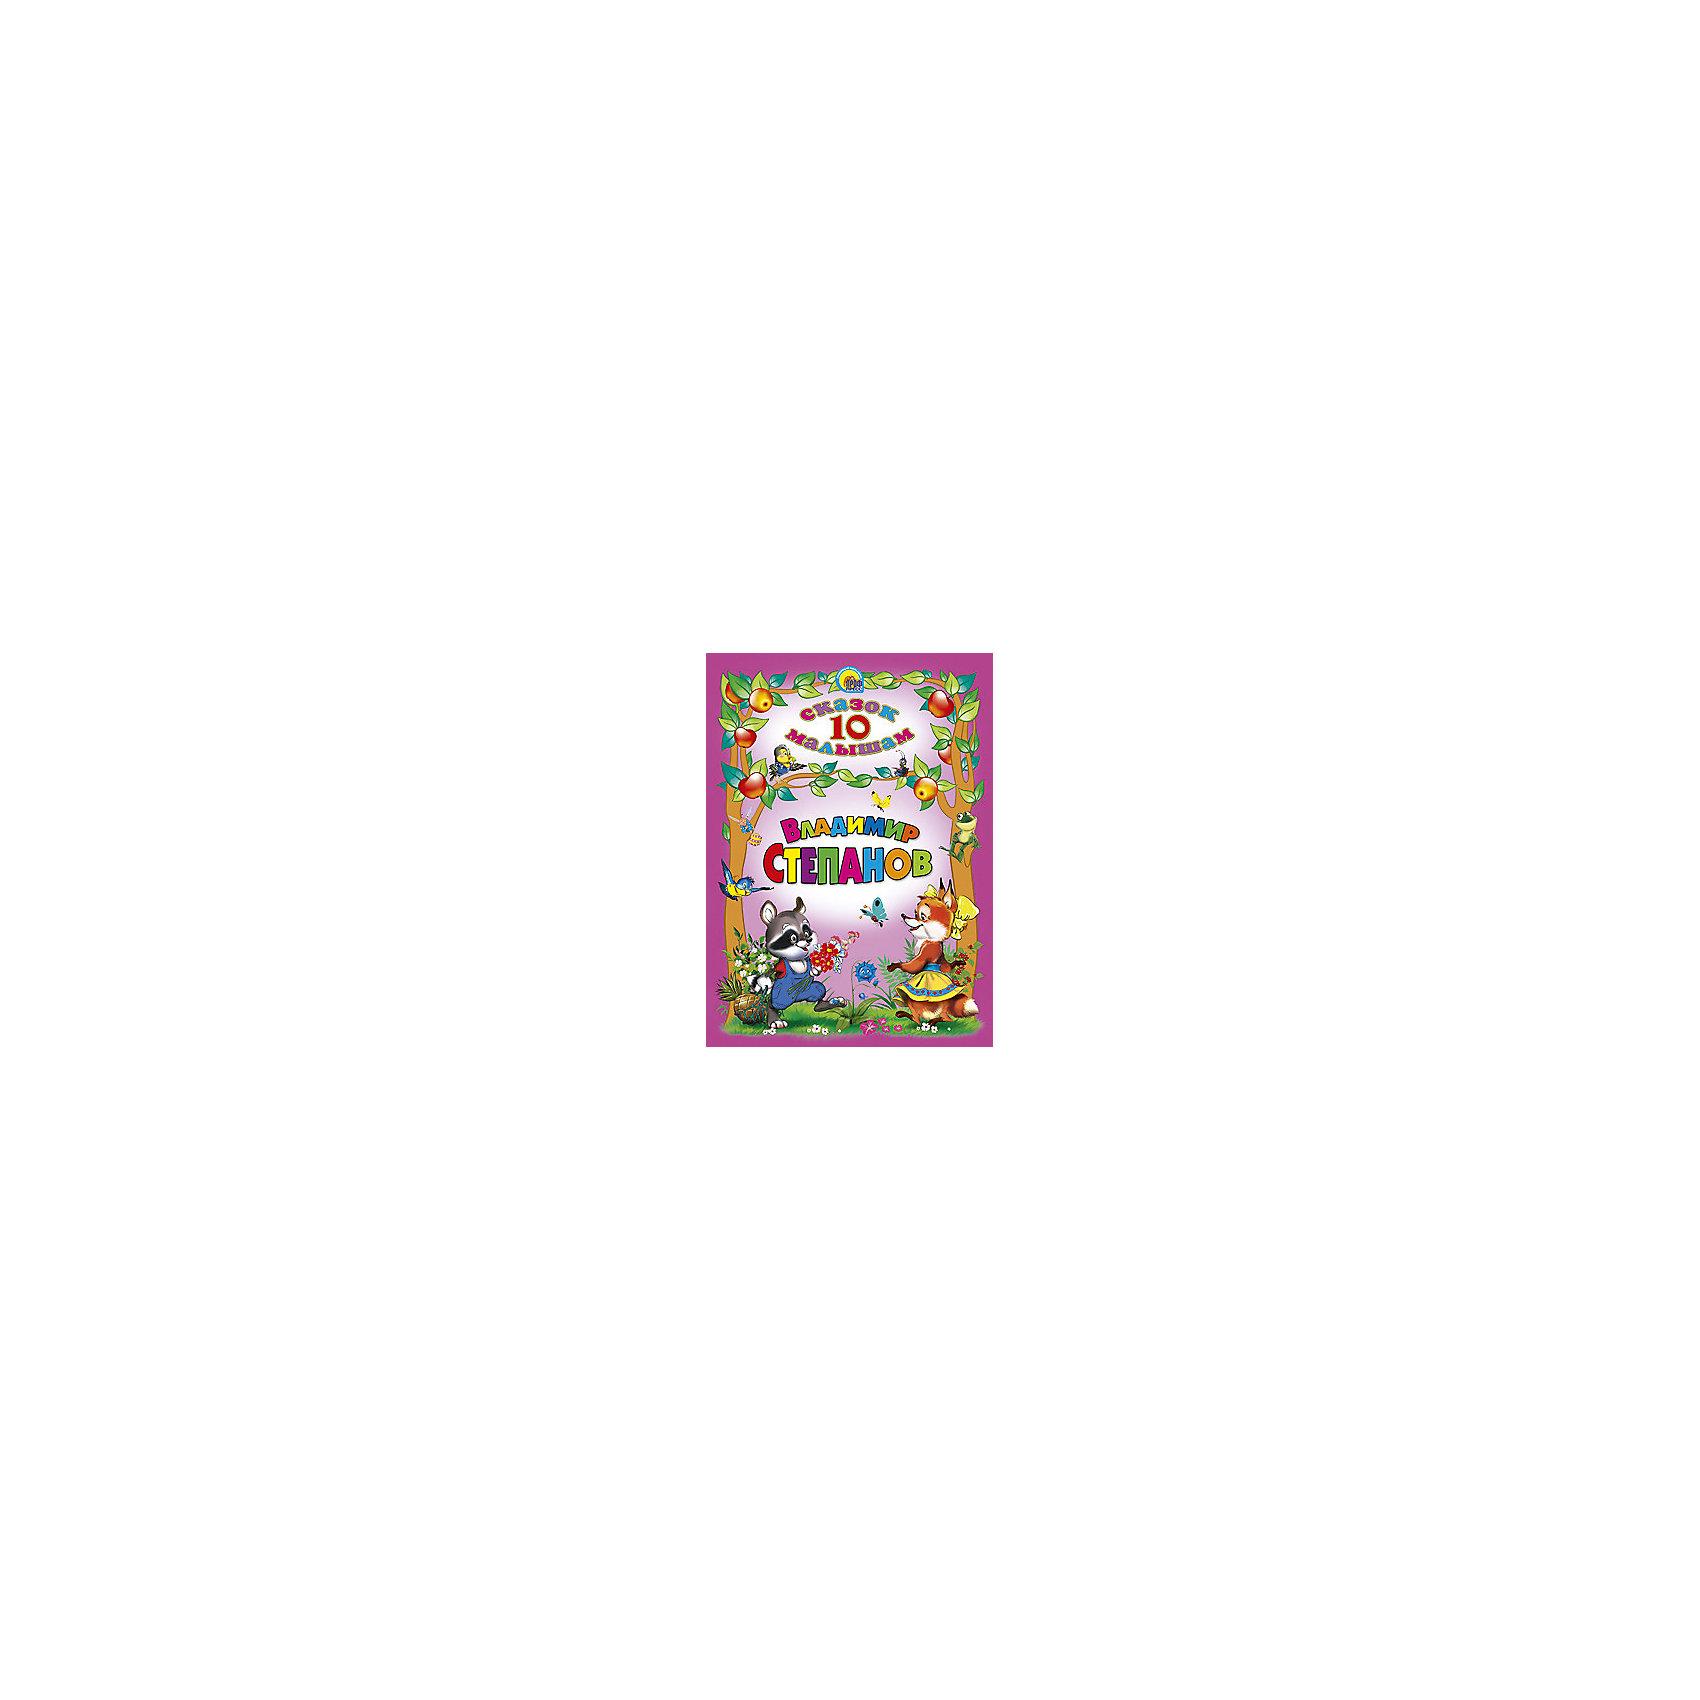 Проф-Пресс 10 сказок. Владимир степанов агхора 2 кундалини 4 издание роберт свобода isbn 978 5 903851 83 6